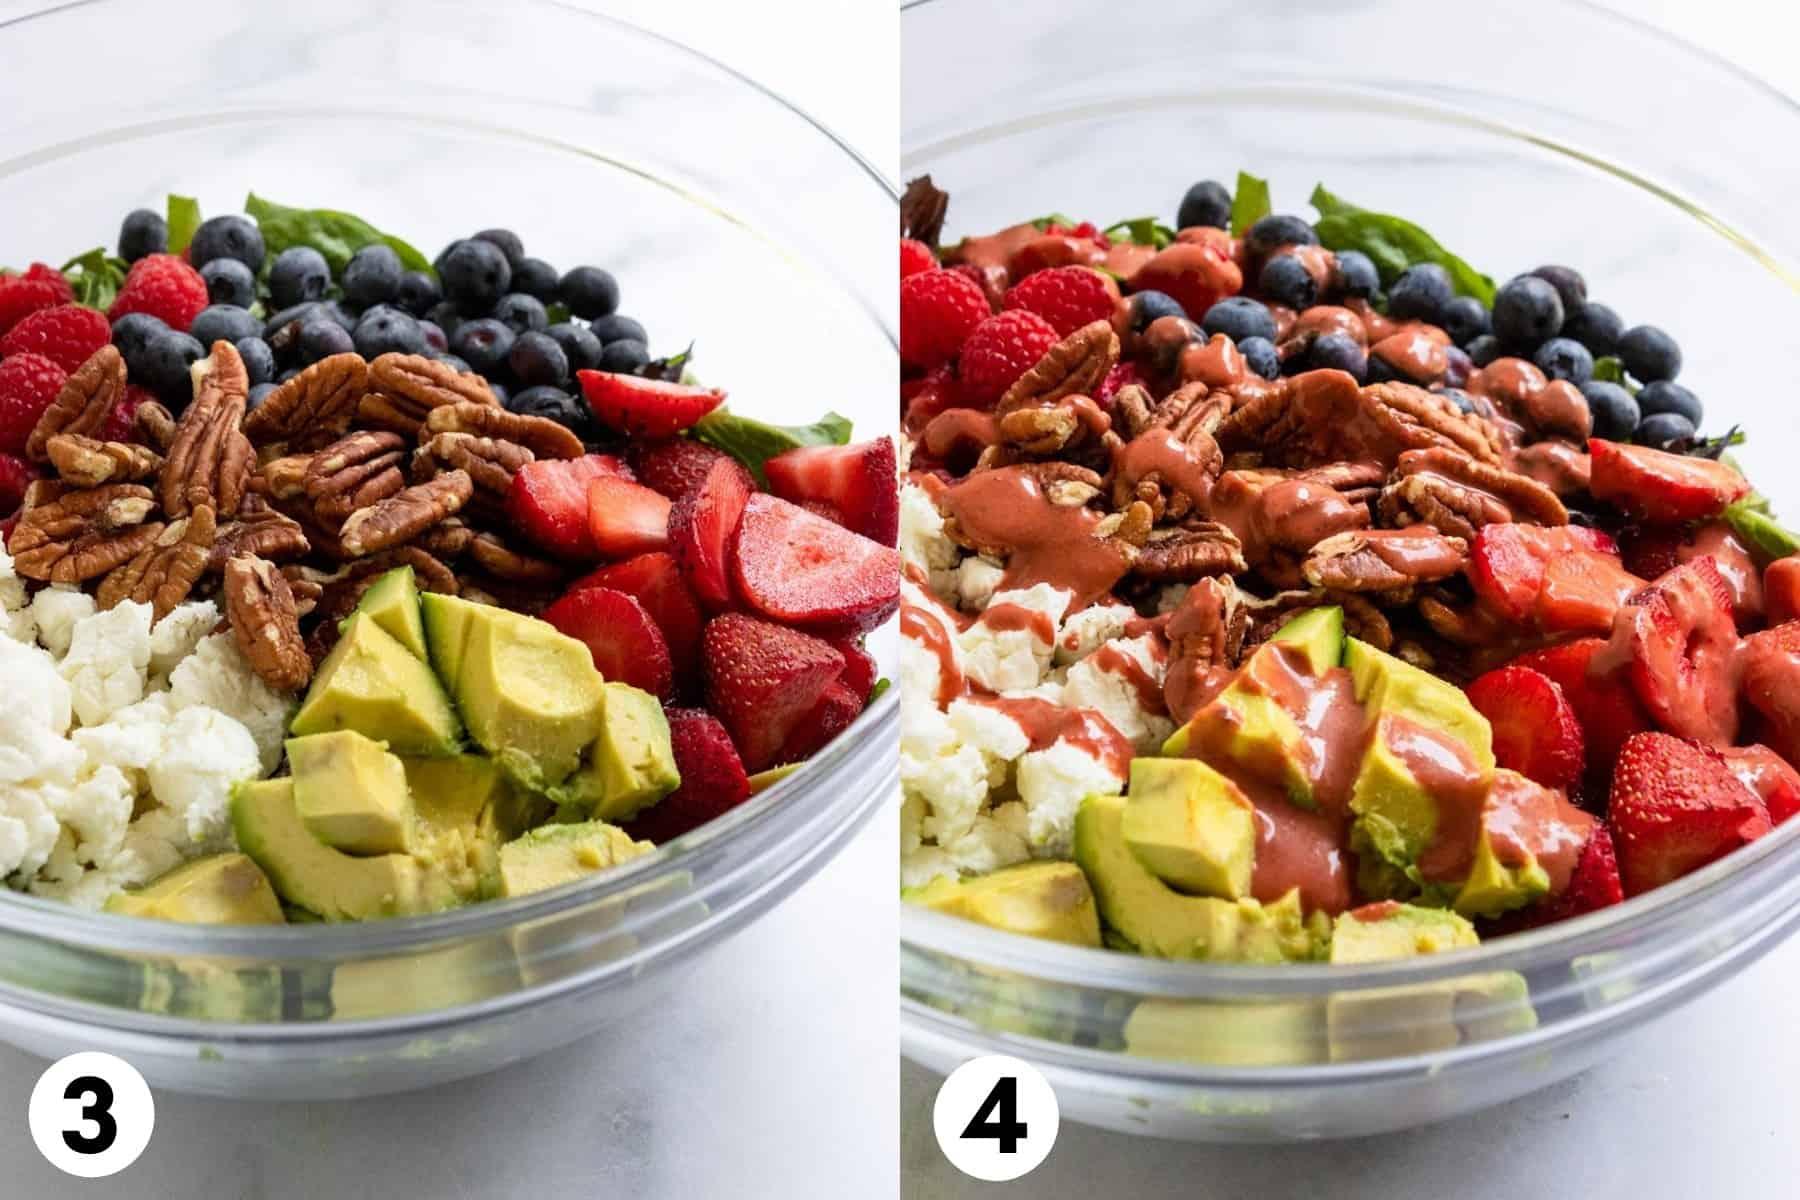 Salad ingredients in mixing bowl.